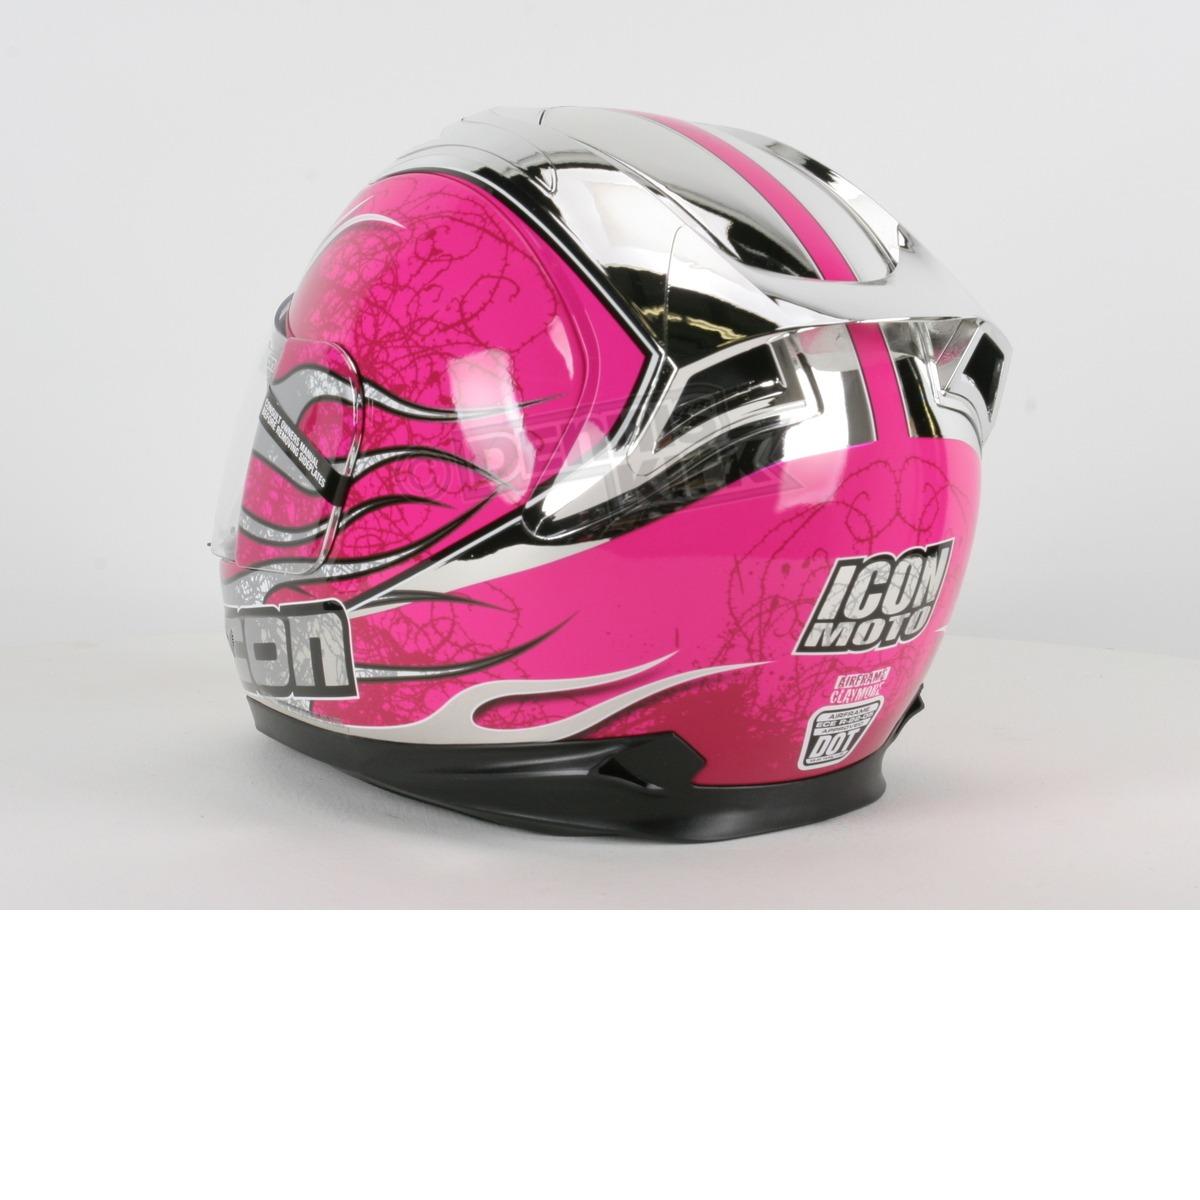 Мотошлем ICON Airframe Claymore Pink Chrome  Артмото - купить квадроцикл в украине и харькове, мотоцикл, снегоход, скутер, мопед, электромобиль